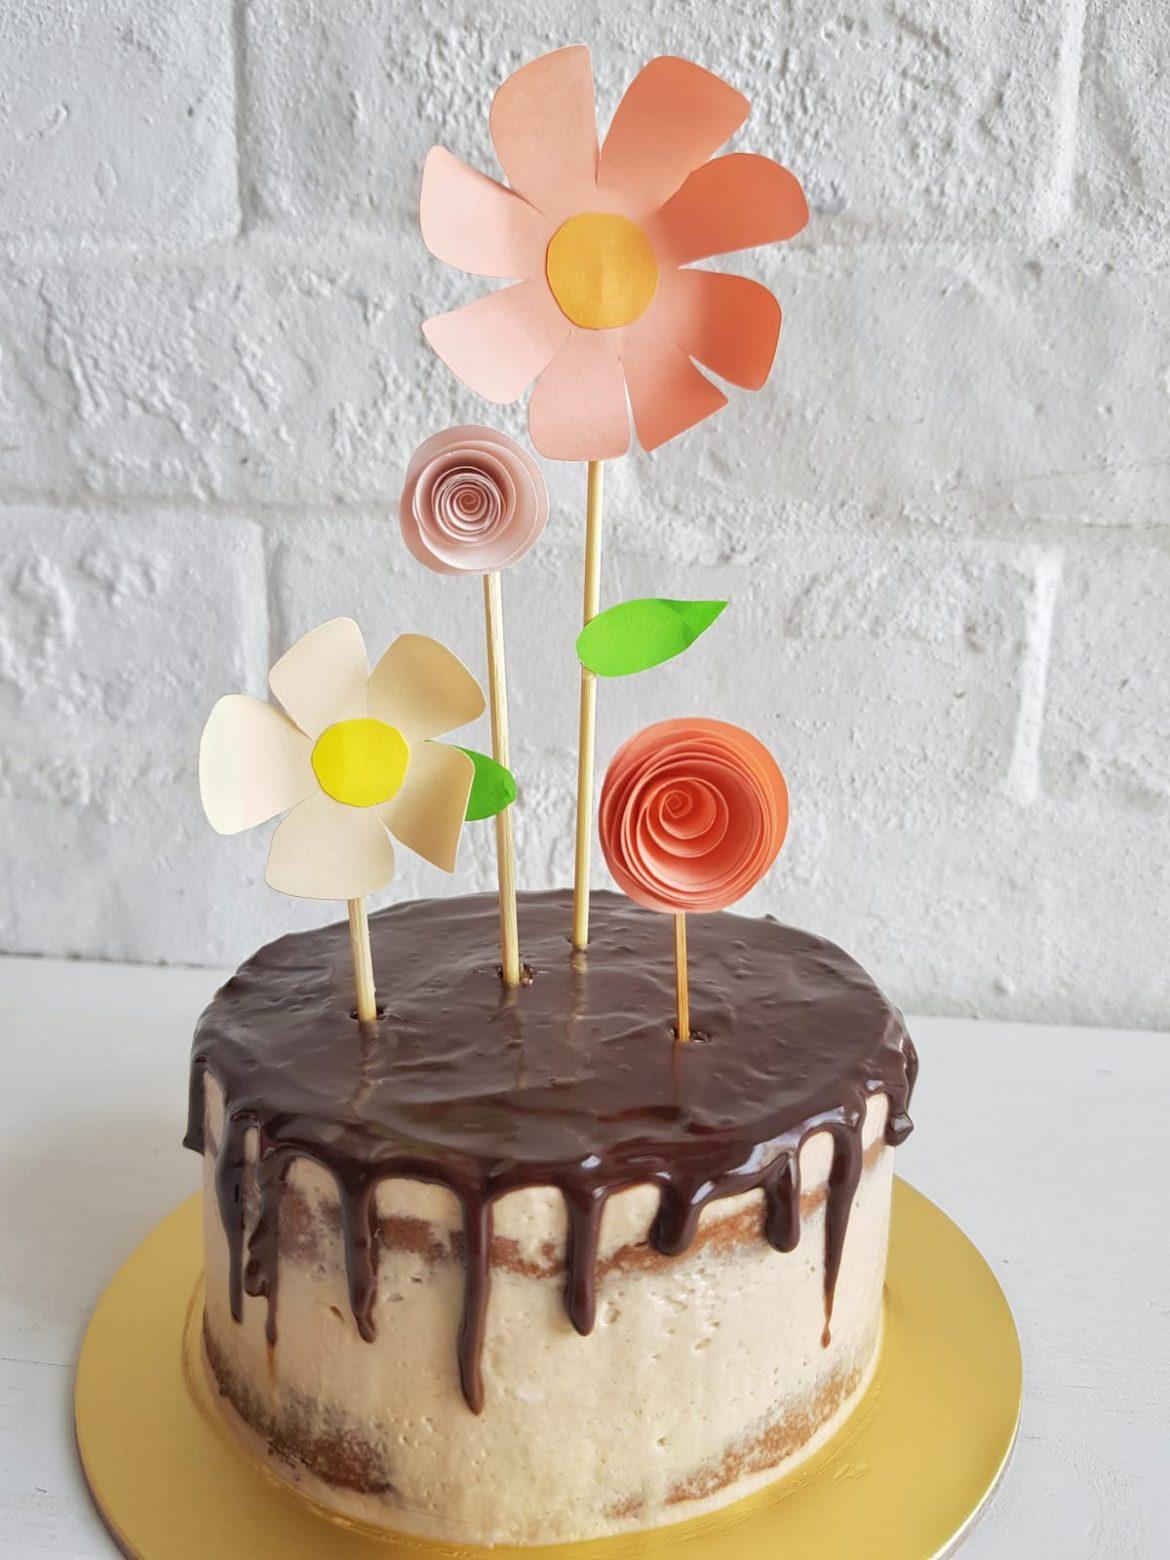 allergen friendly chocolate crazy cake with aquafaba swiss meringue frosting and chocolate ganache